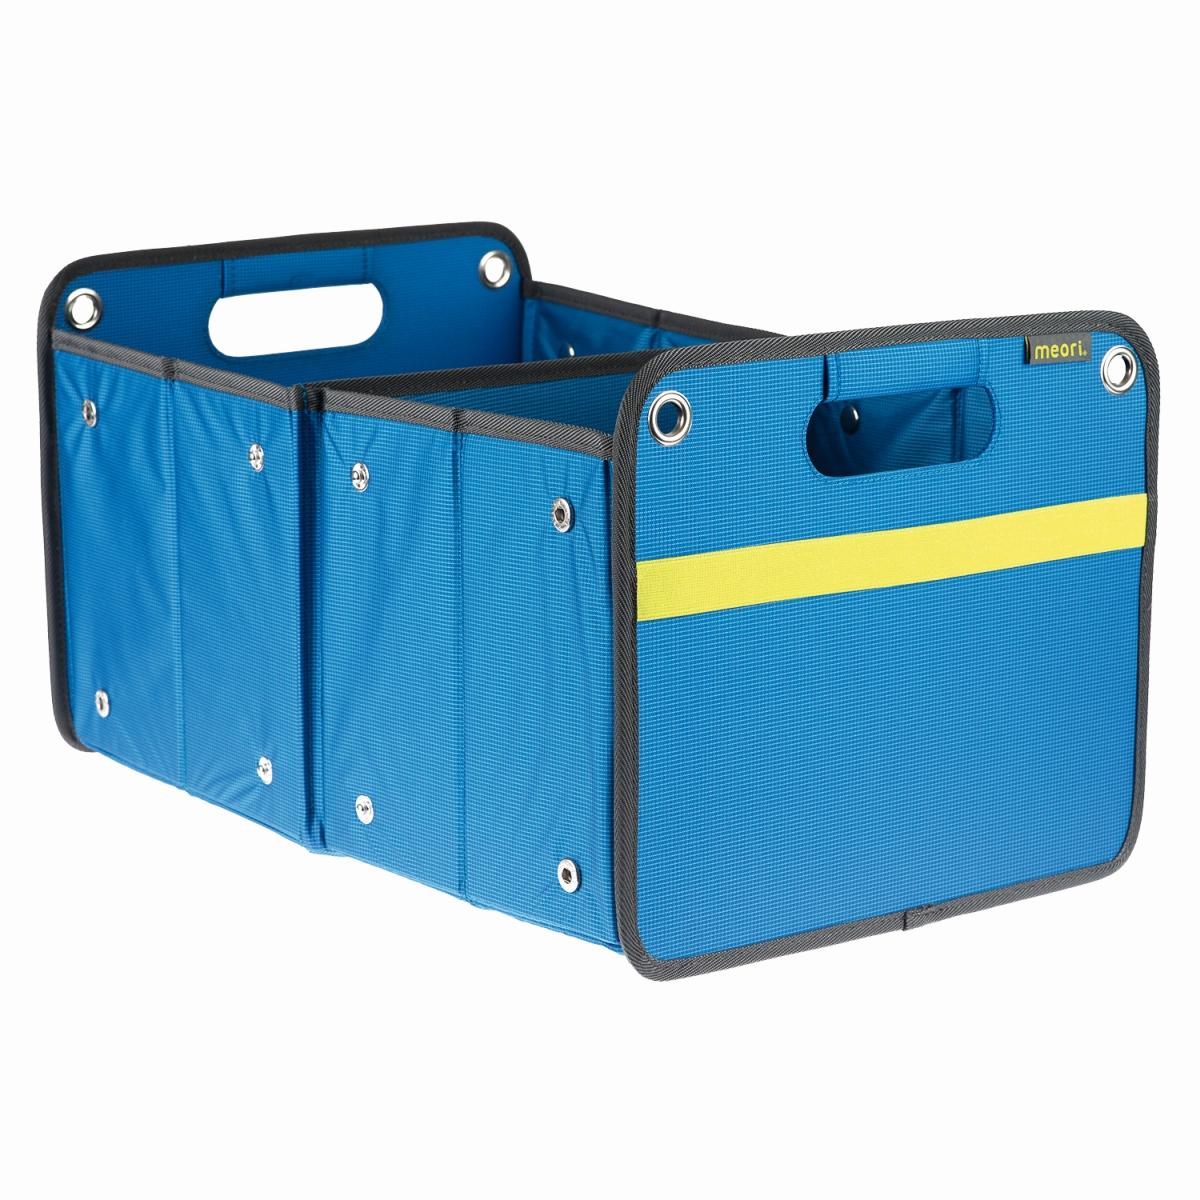 Meori Faltbox Outdoor L mittelmeerblau